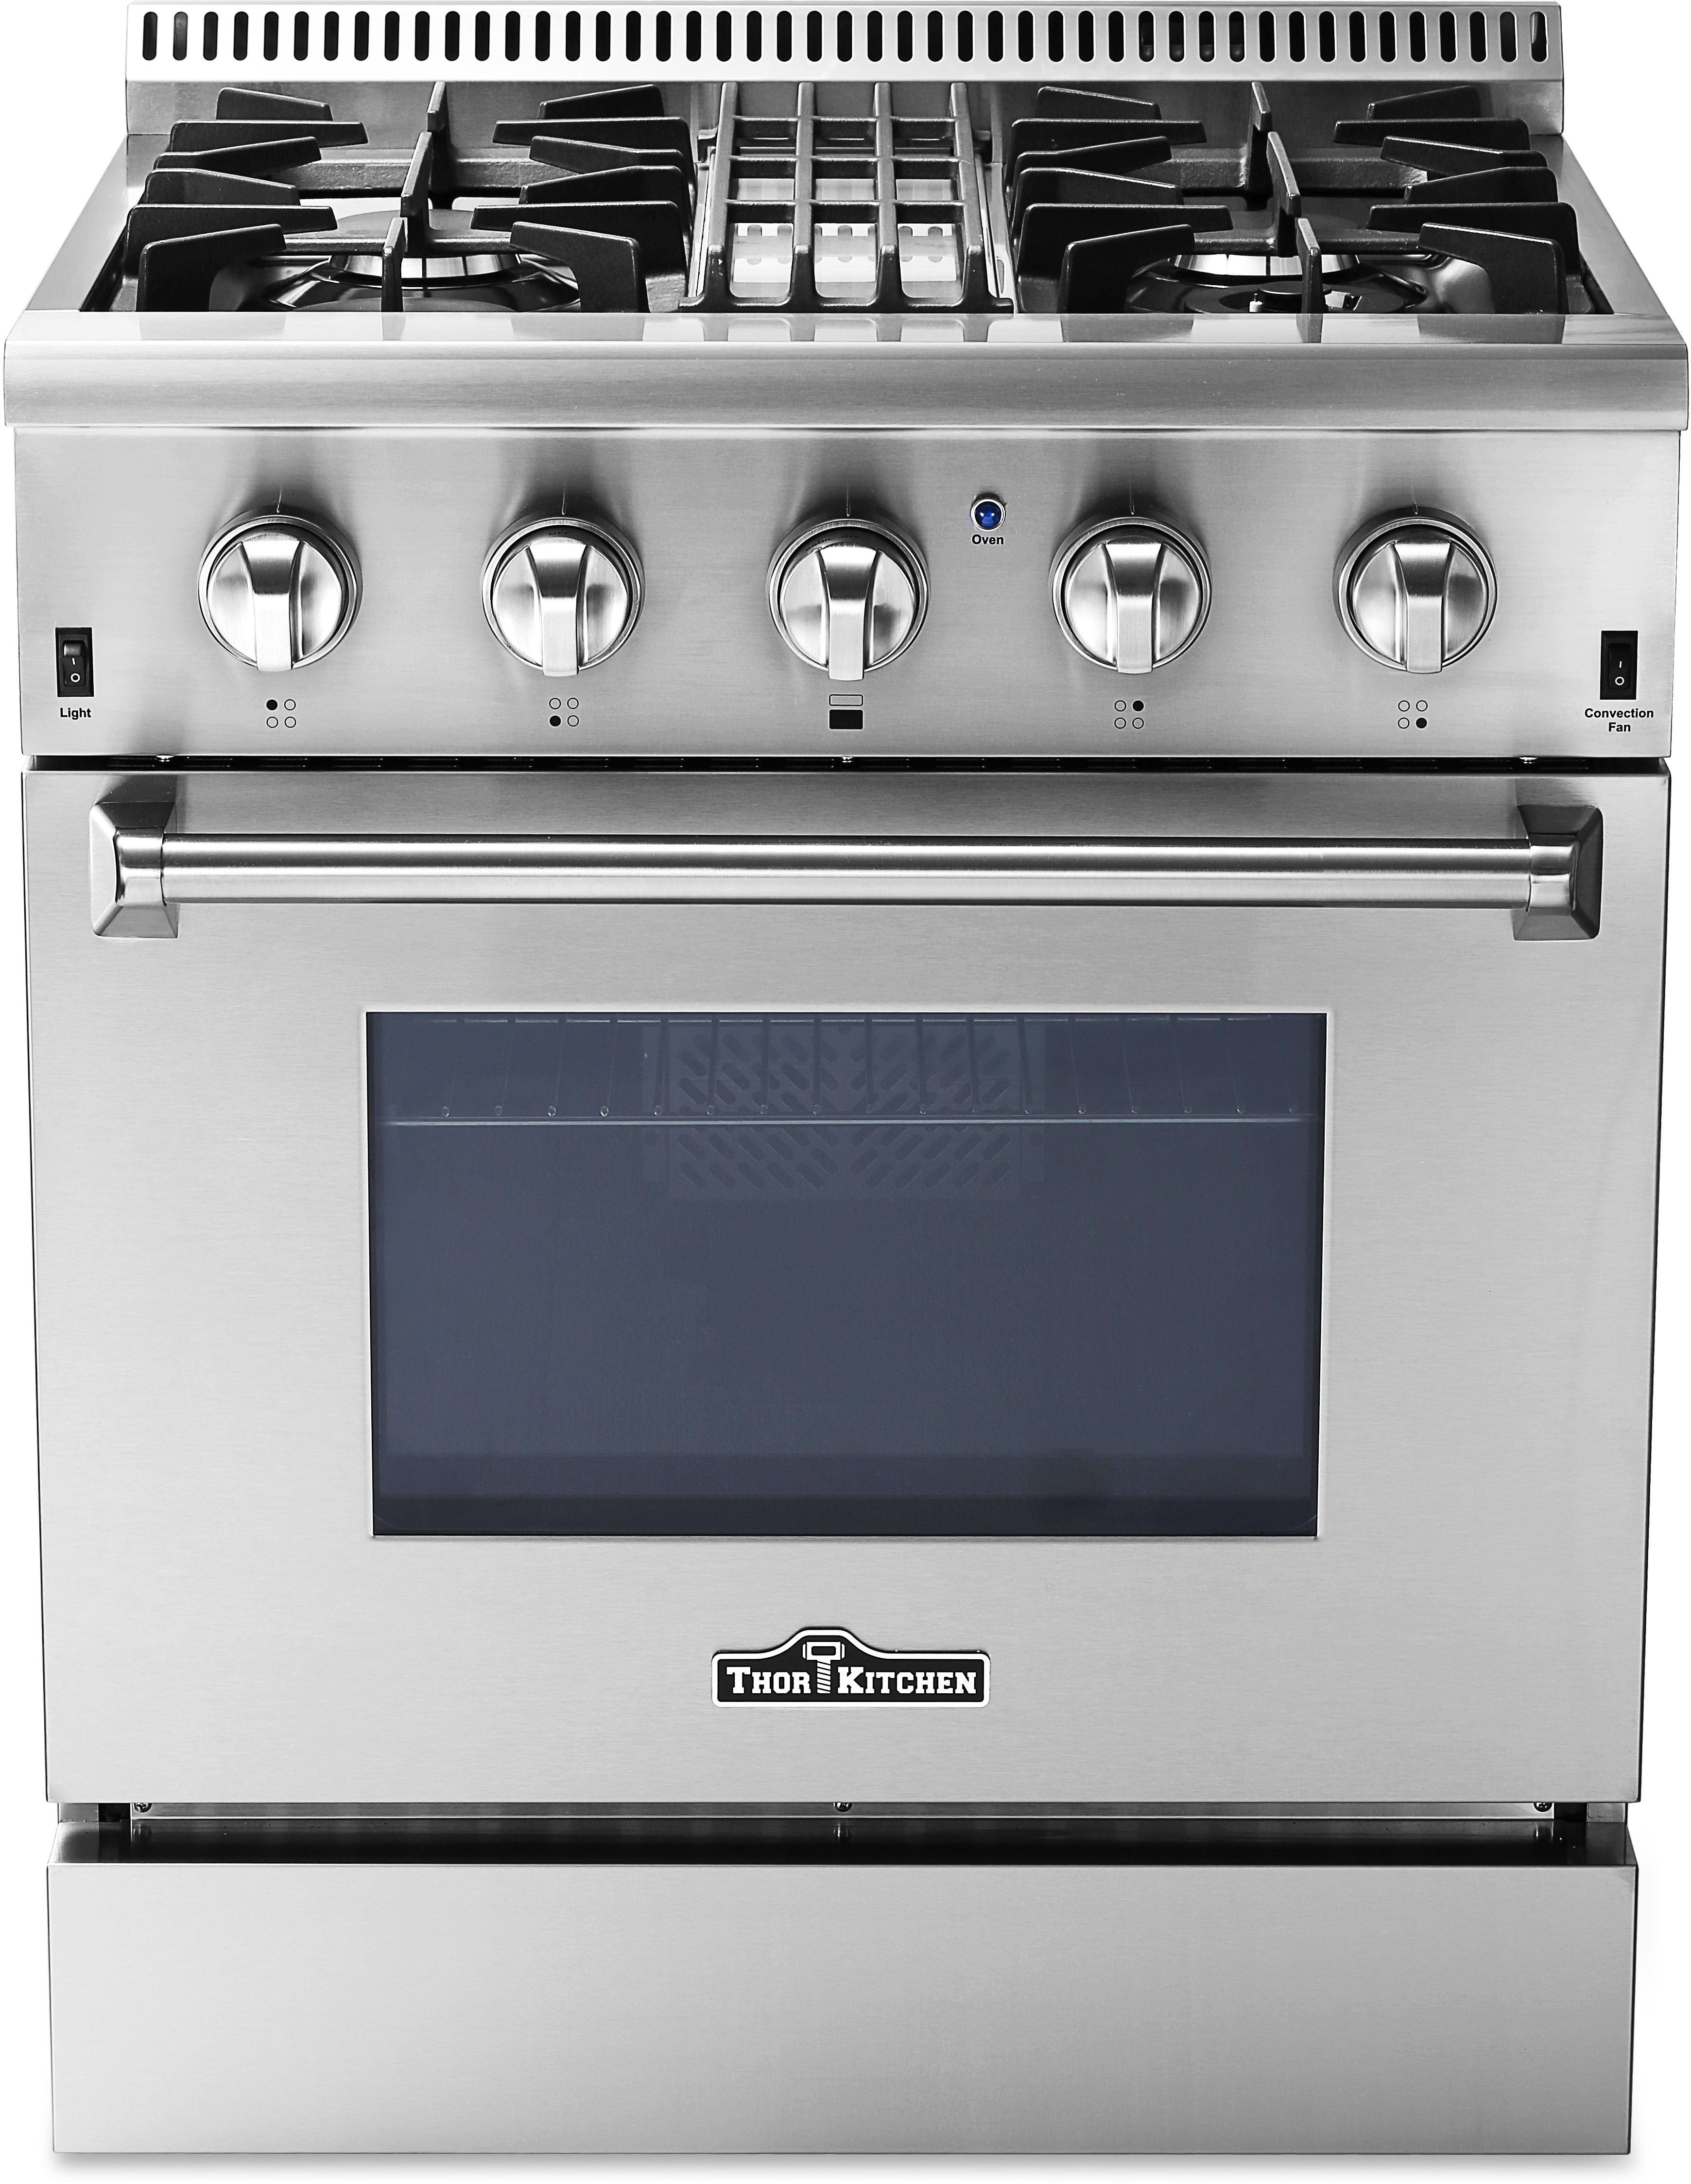 Thor Kitchen Hrd3088u 30 Inch Freestanding Dual Fuel Range